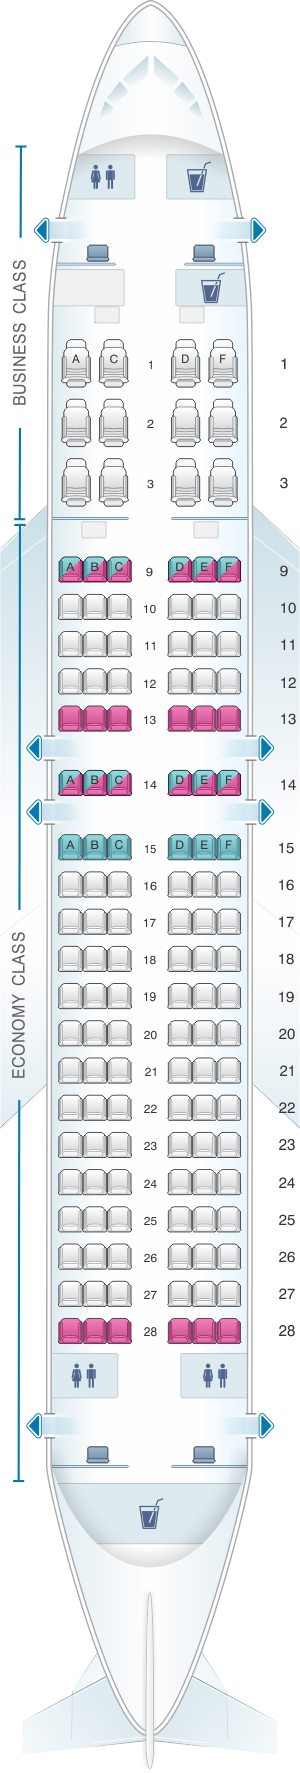 Seat map for Qatar Airways Airbus A320 200 144pax